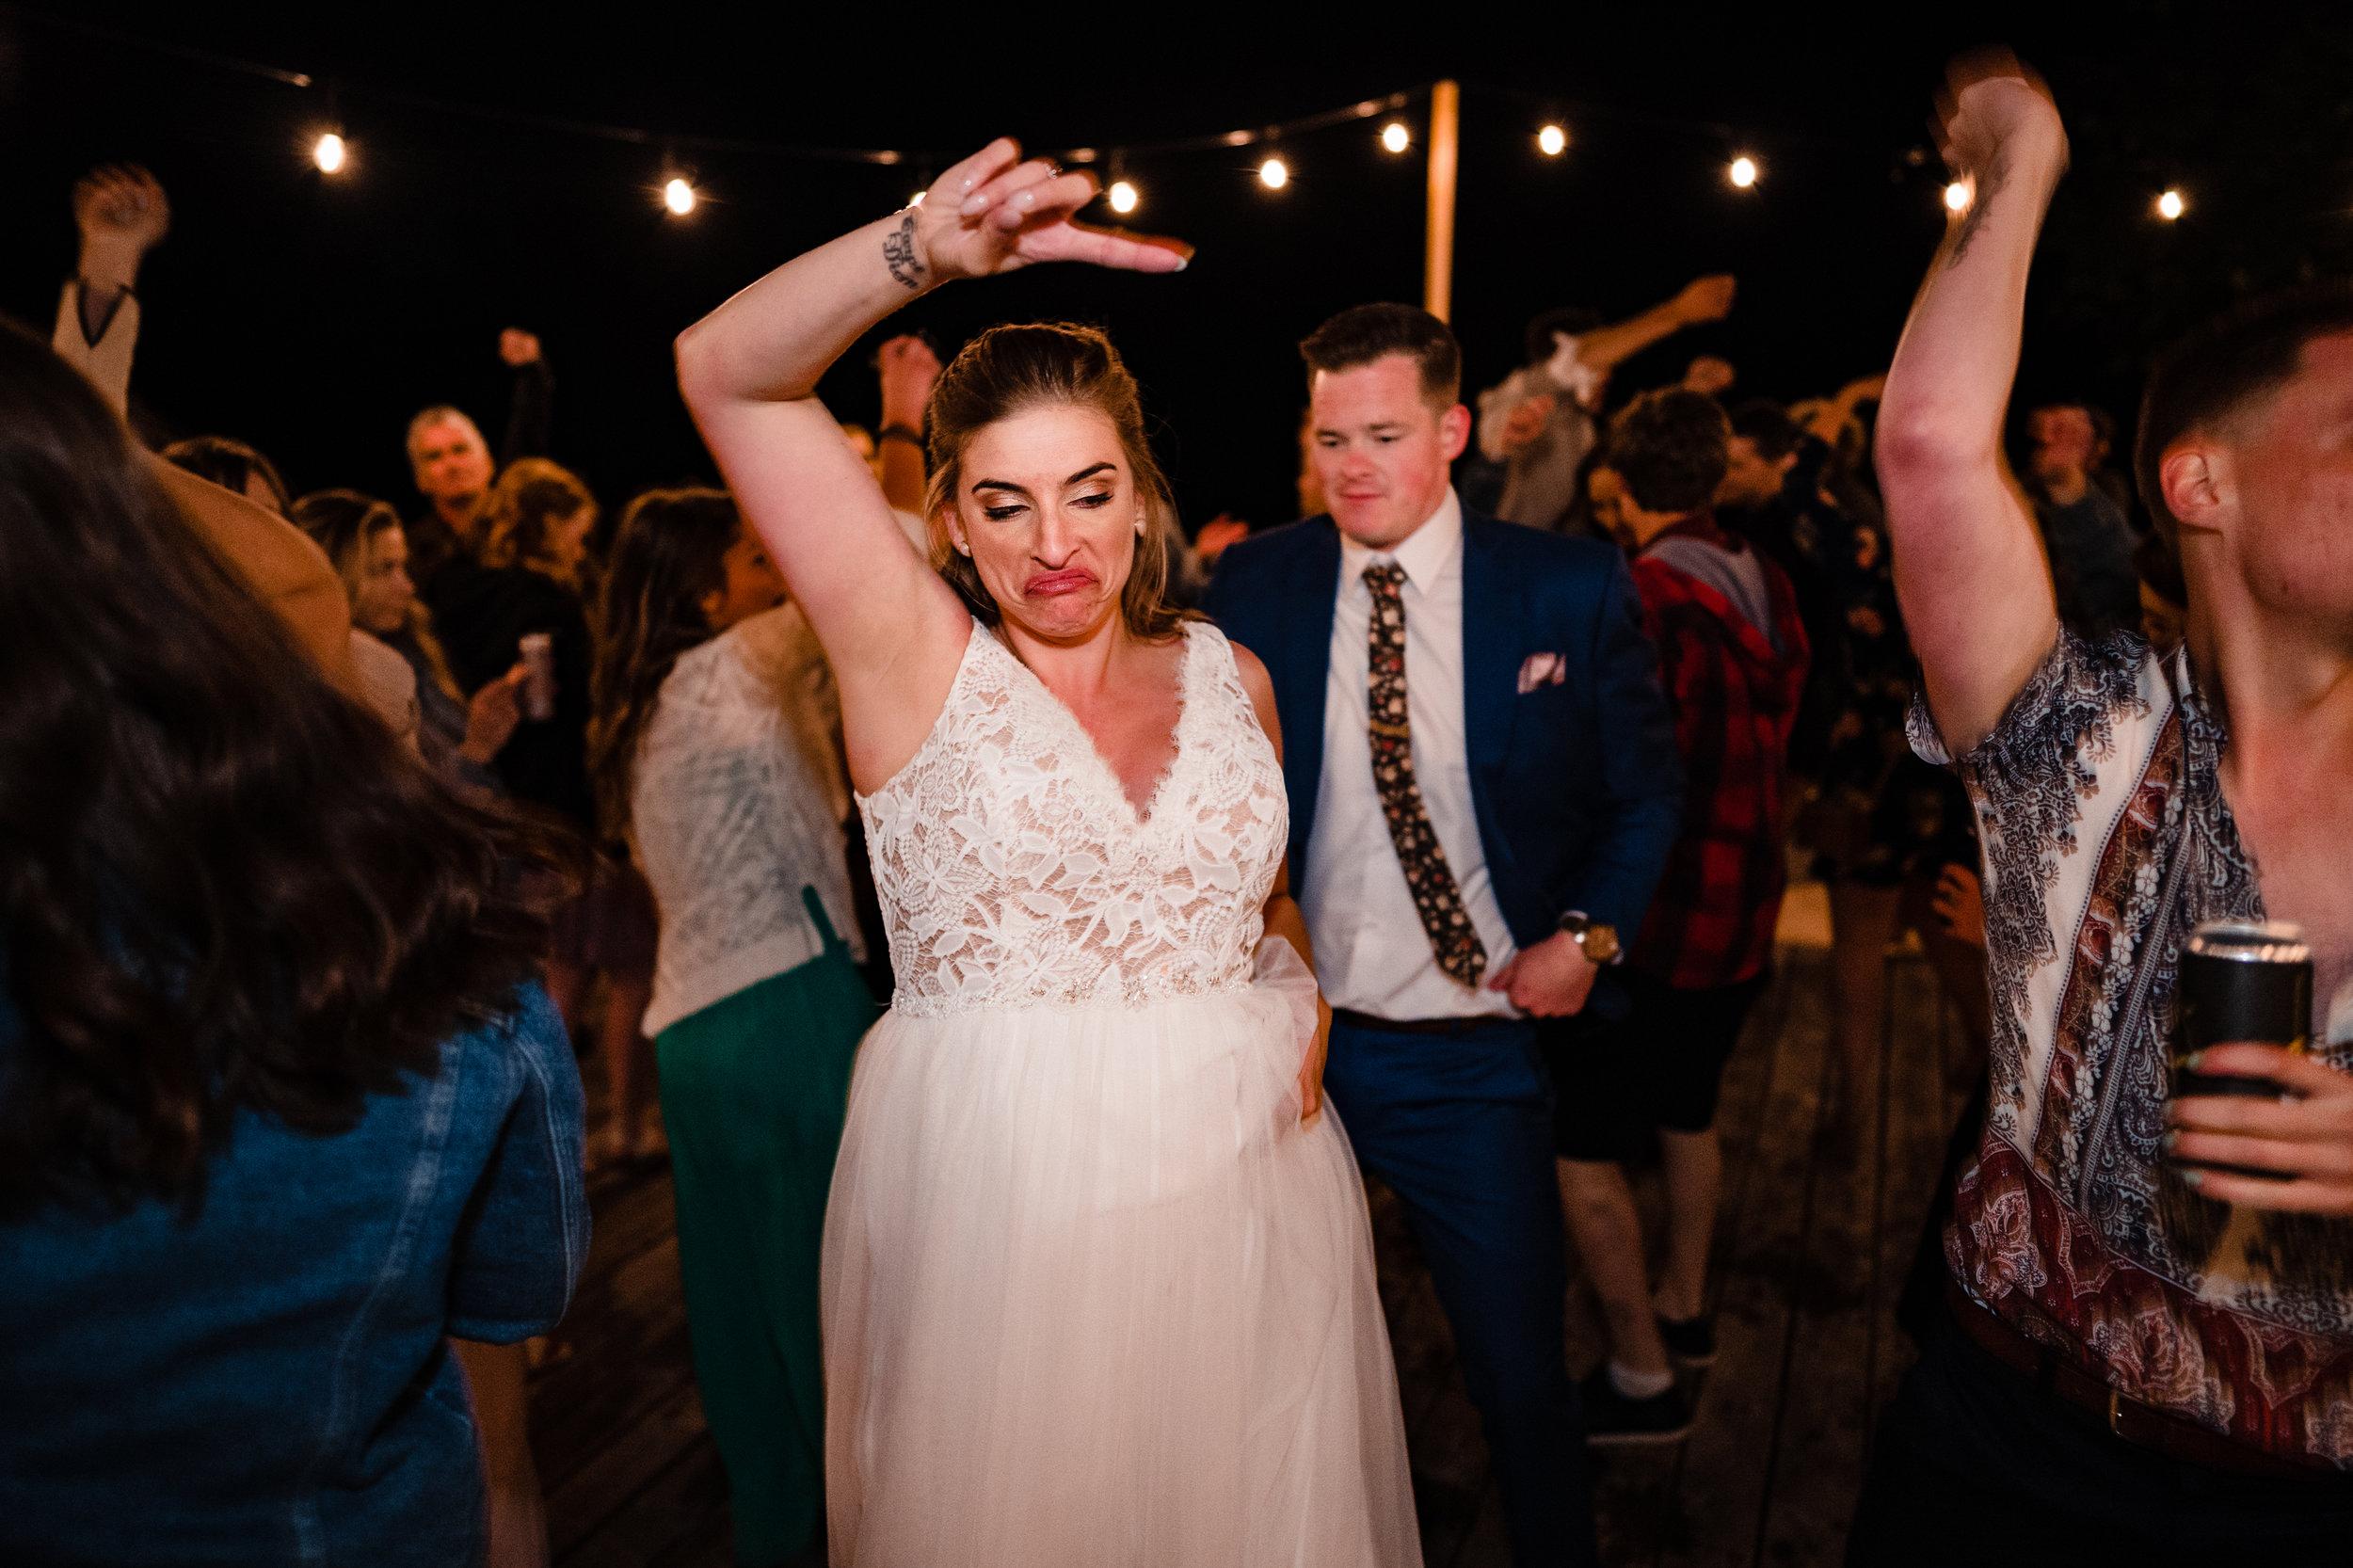 Janelle-Mitch-Halifax-Wedding-Nova-Scotia-Photography (156 of 163).jpg